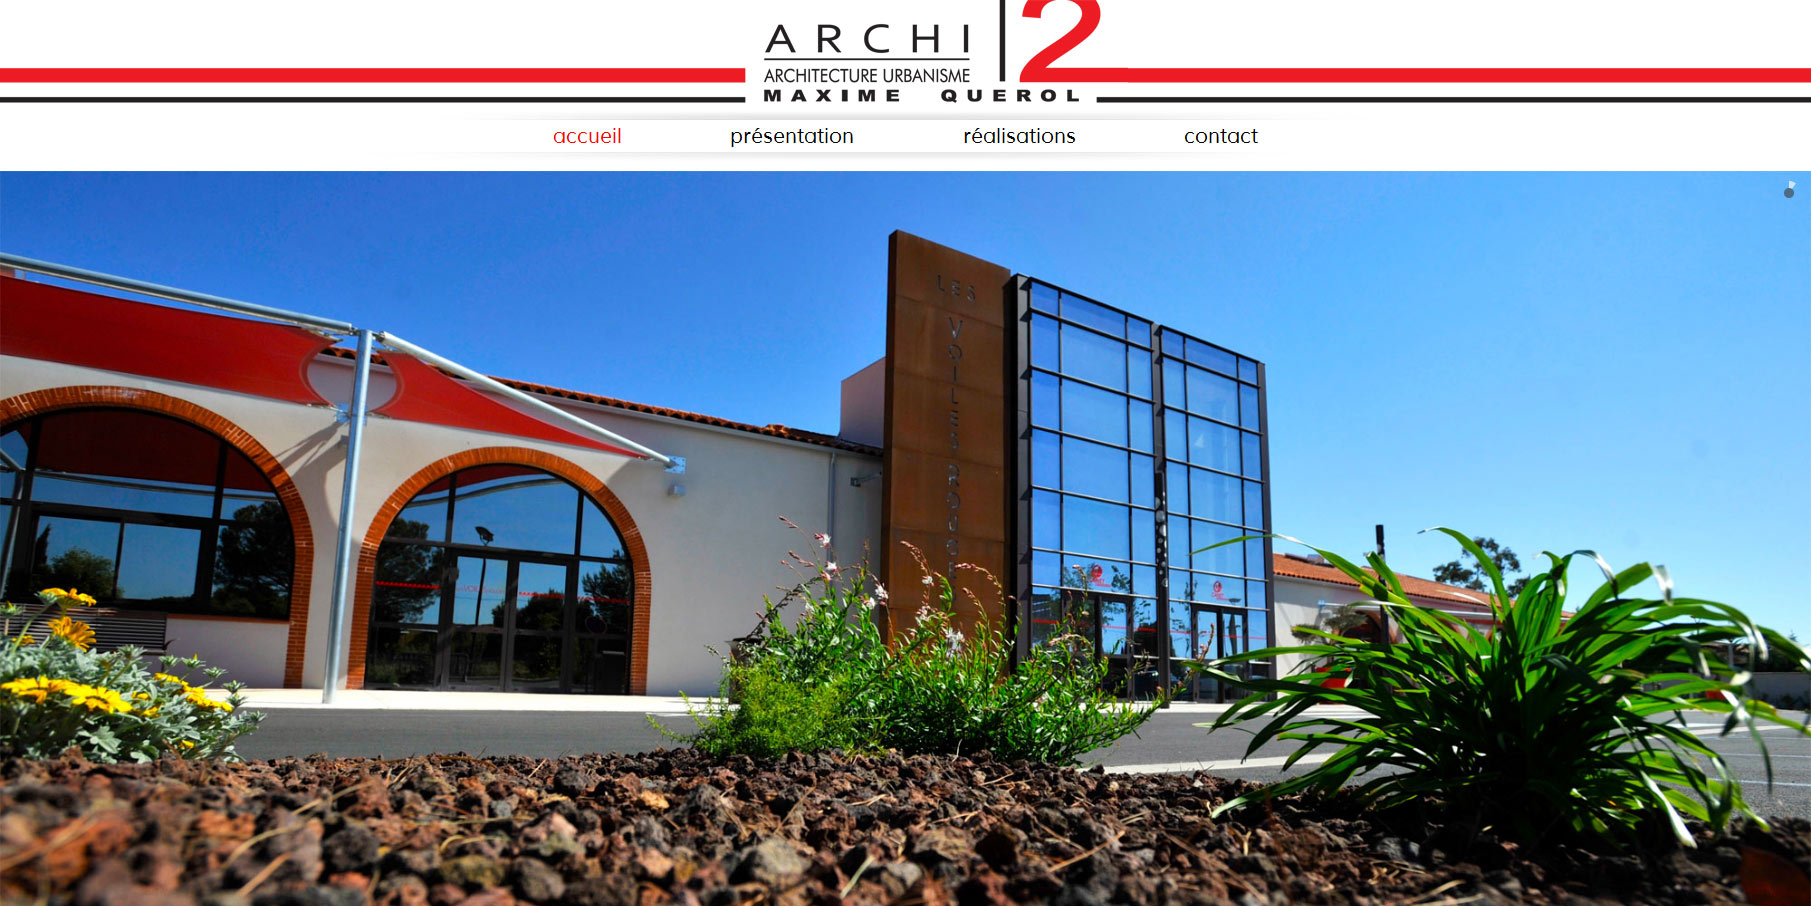 Architecte Archi2